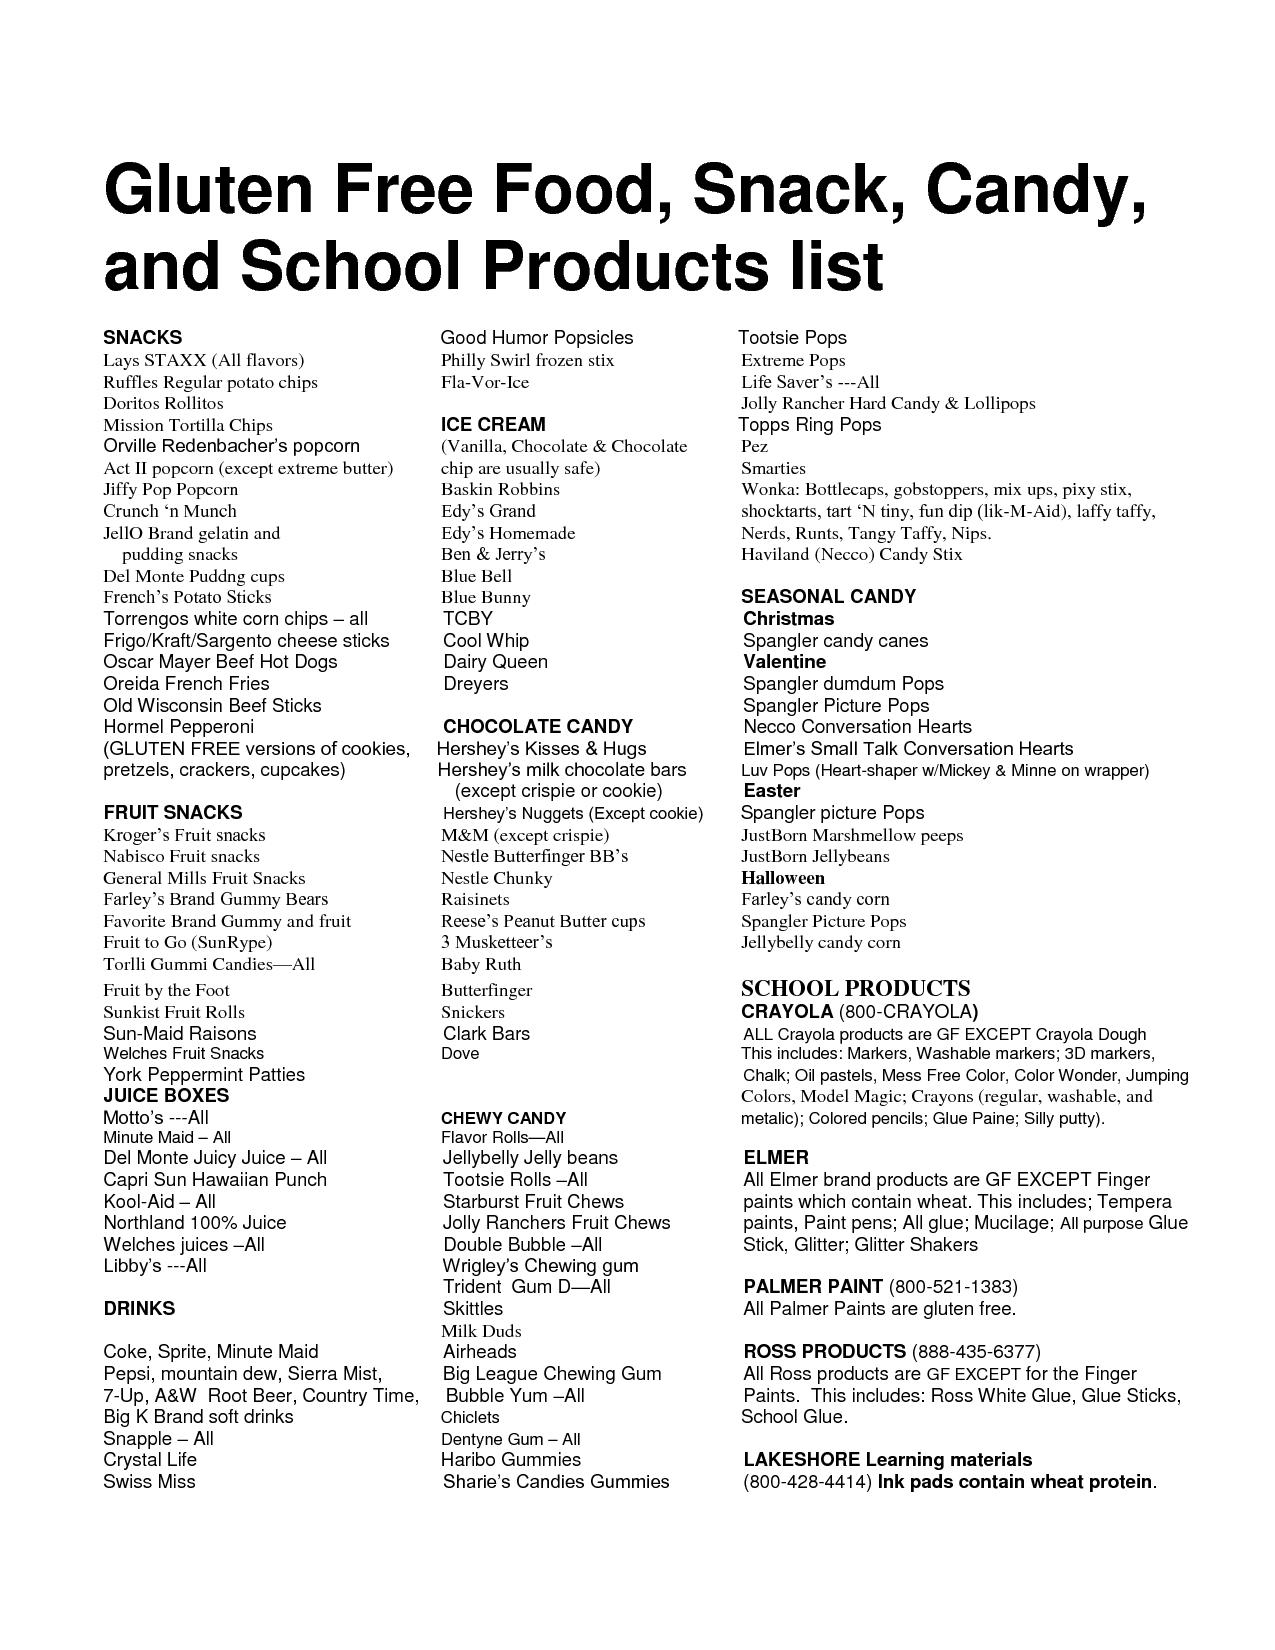 list of foods that are gluten free | gluten free food list